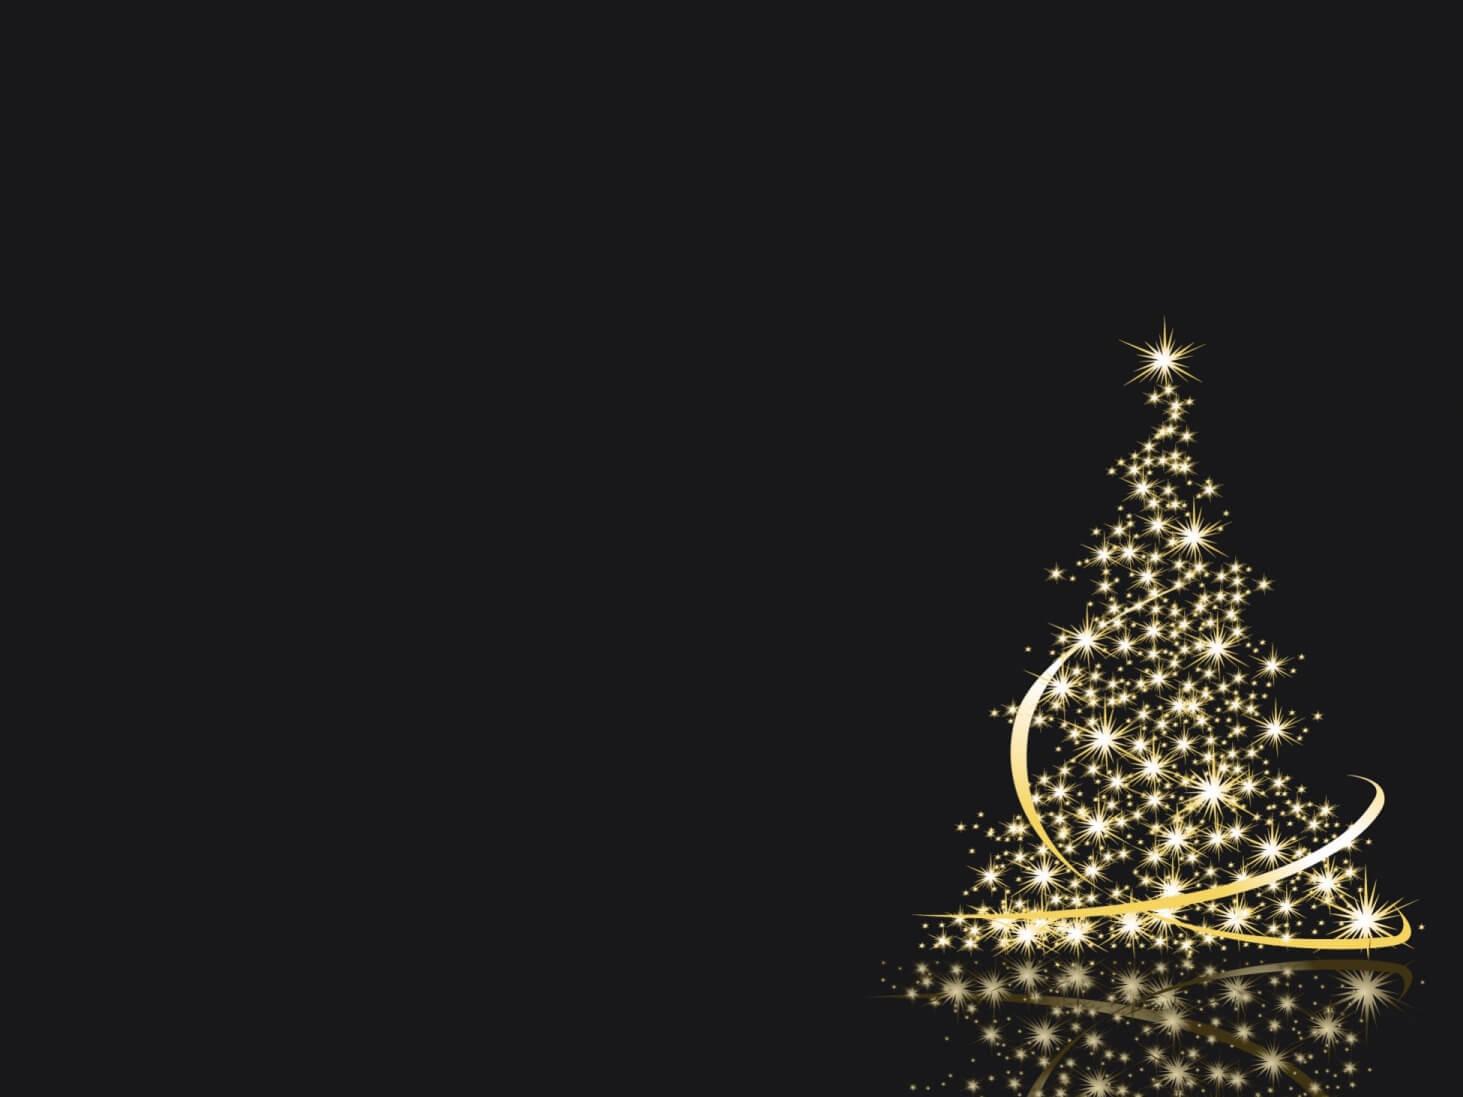 Abstract Golden Christmas Tree Artwork Wallpaper